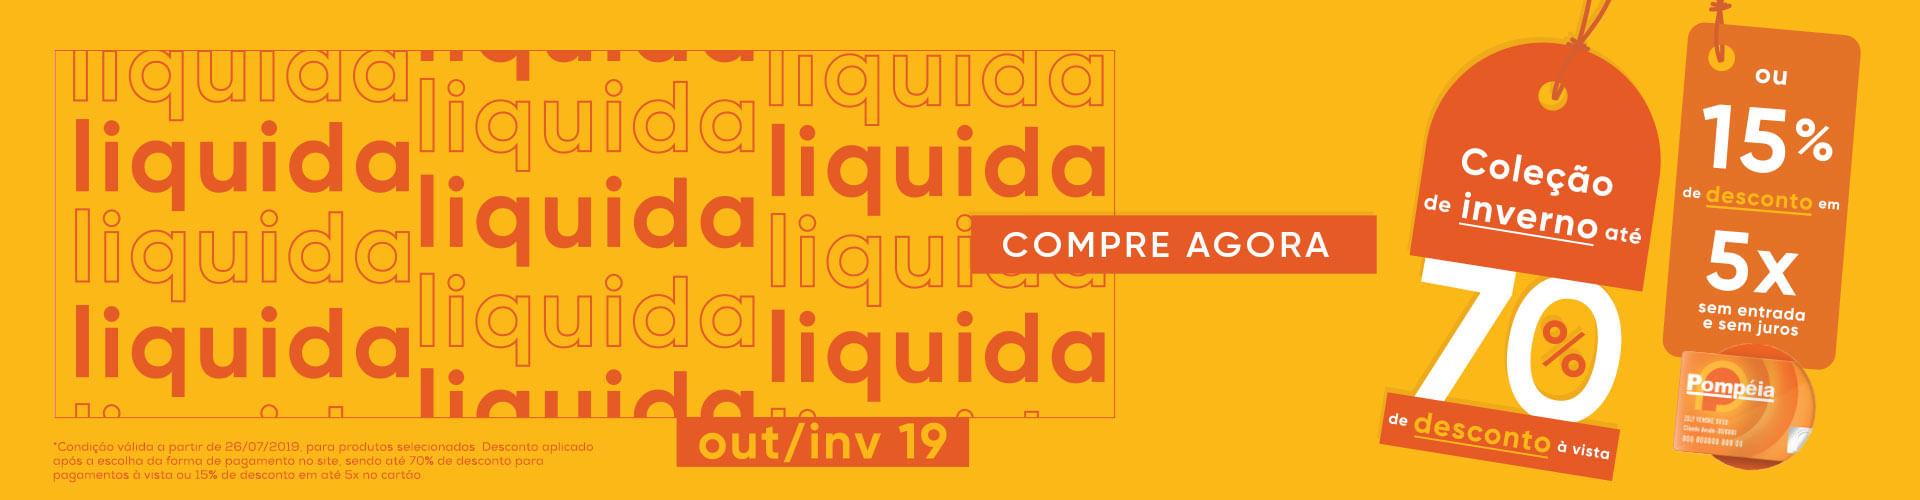 2b64ba3cbc Loja de Roupas: Moda Feminina, Masculina e Infantil - Lojas Pompéia